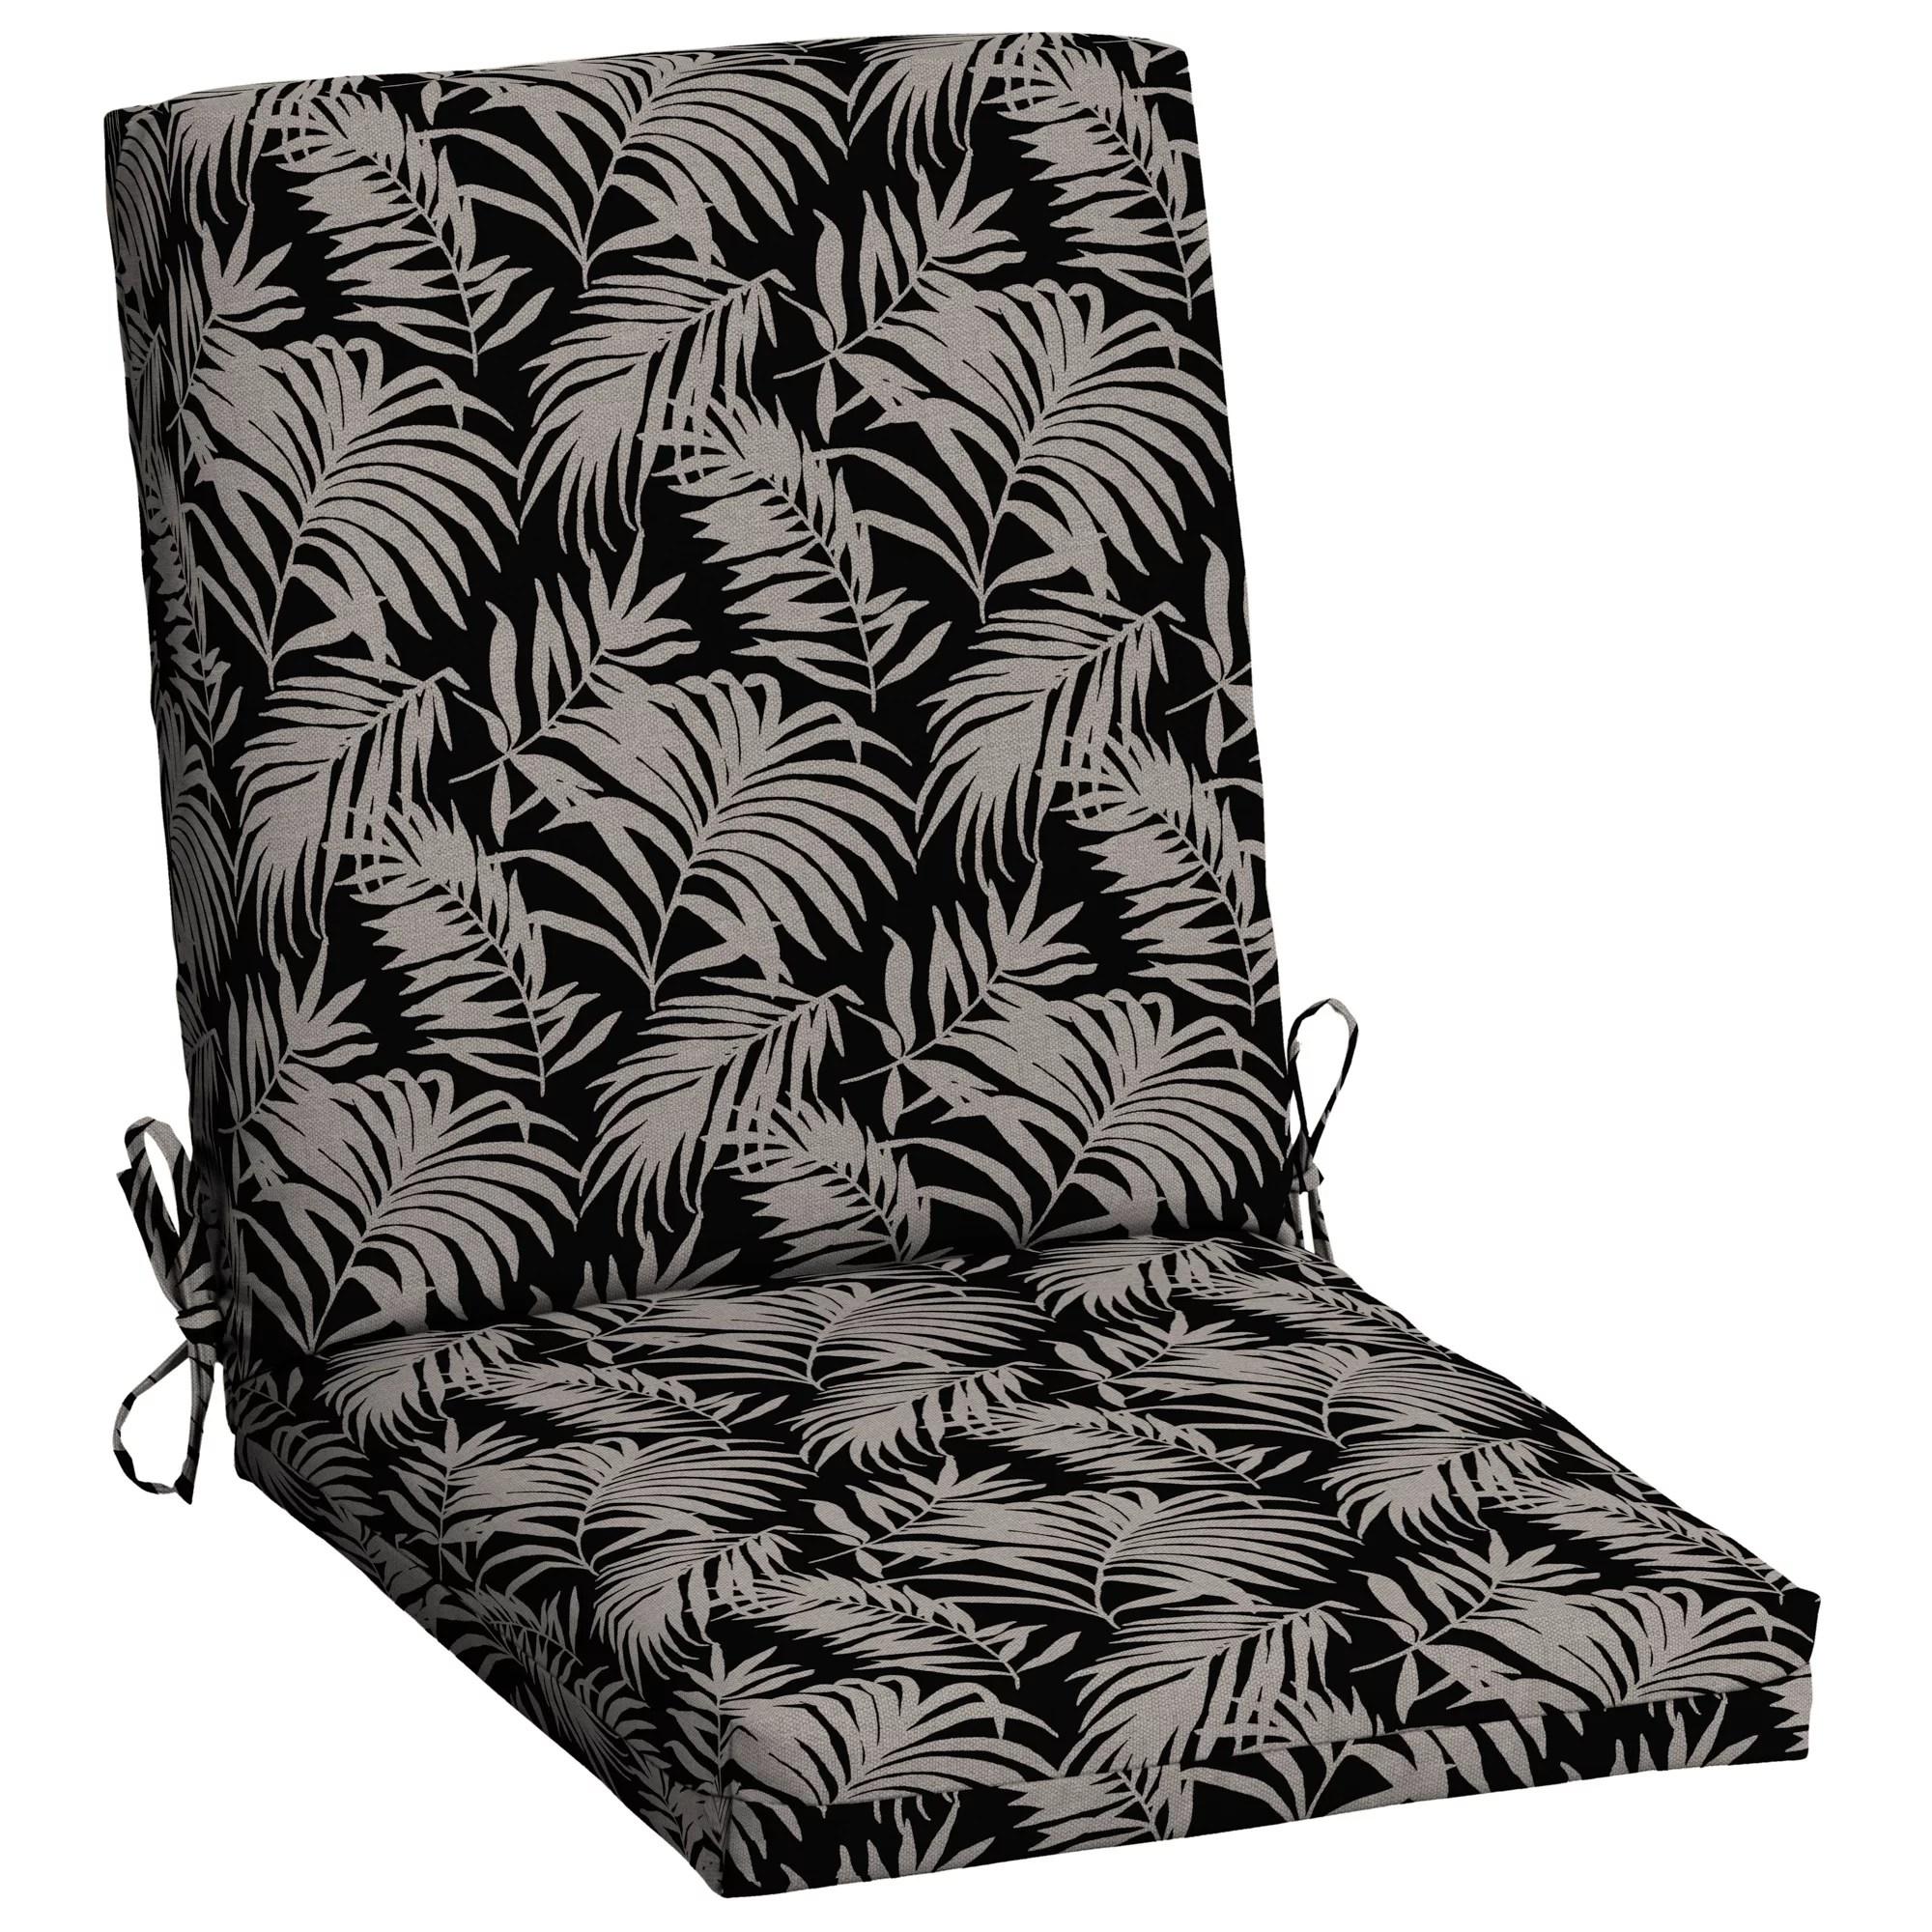 mainstays black and tan palm 43 x 20 in outdoor chair cushion walmart com